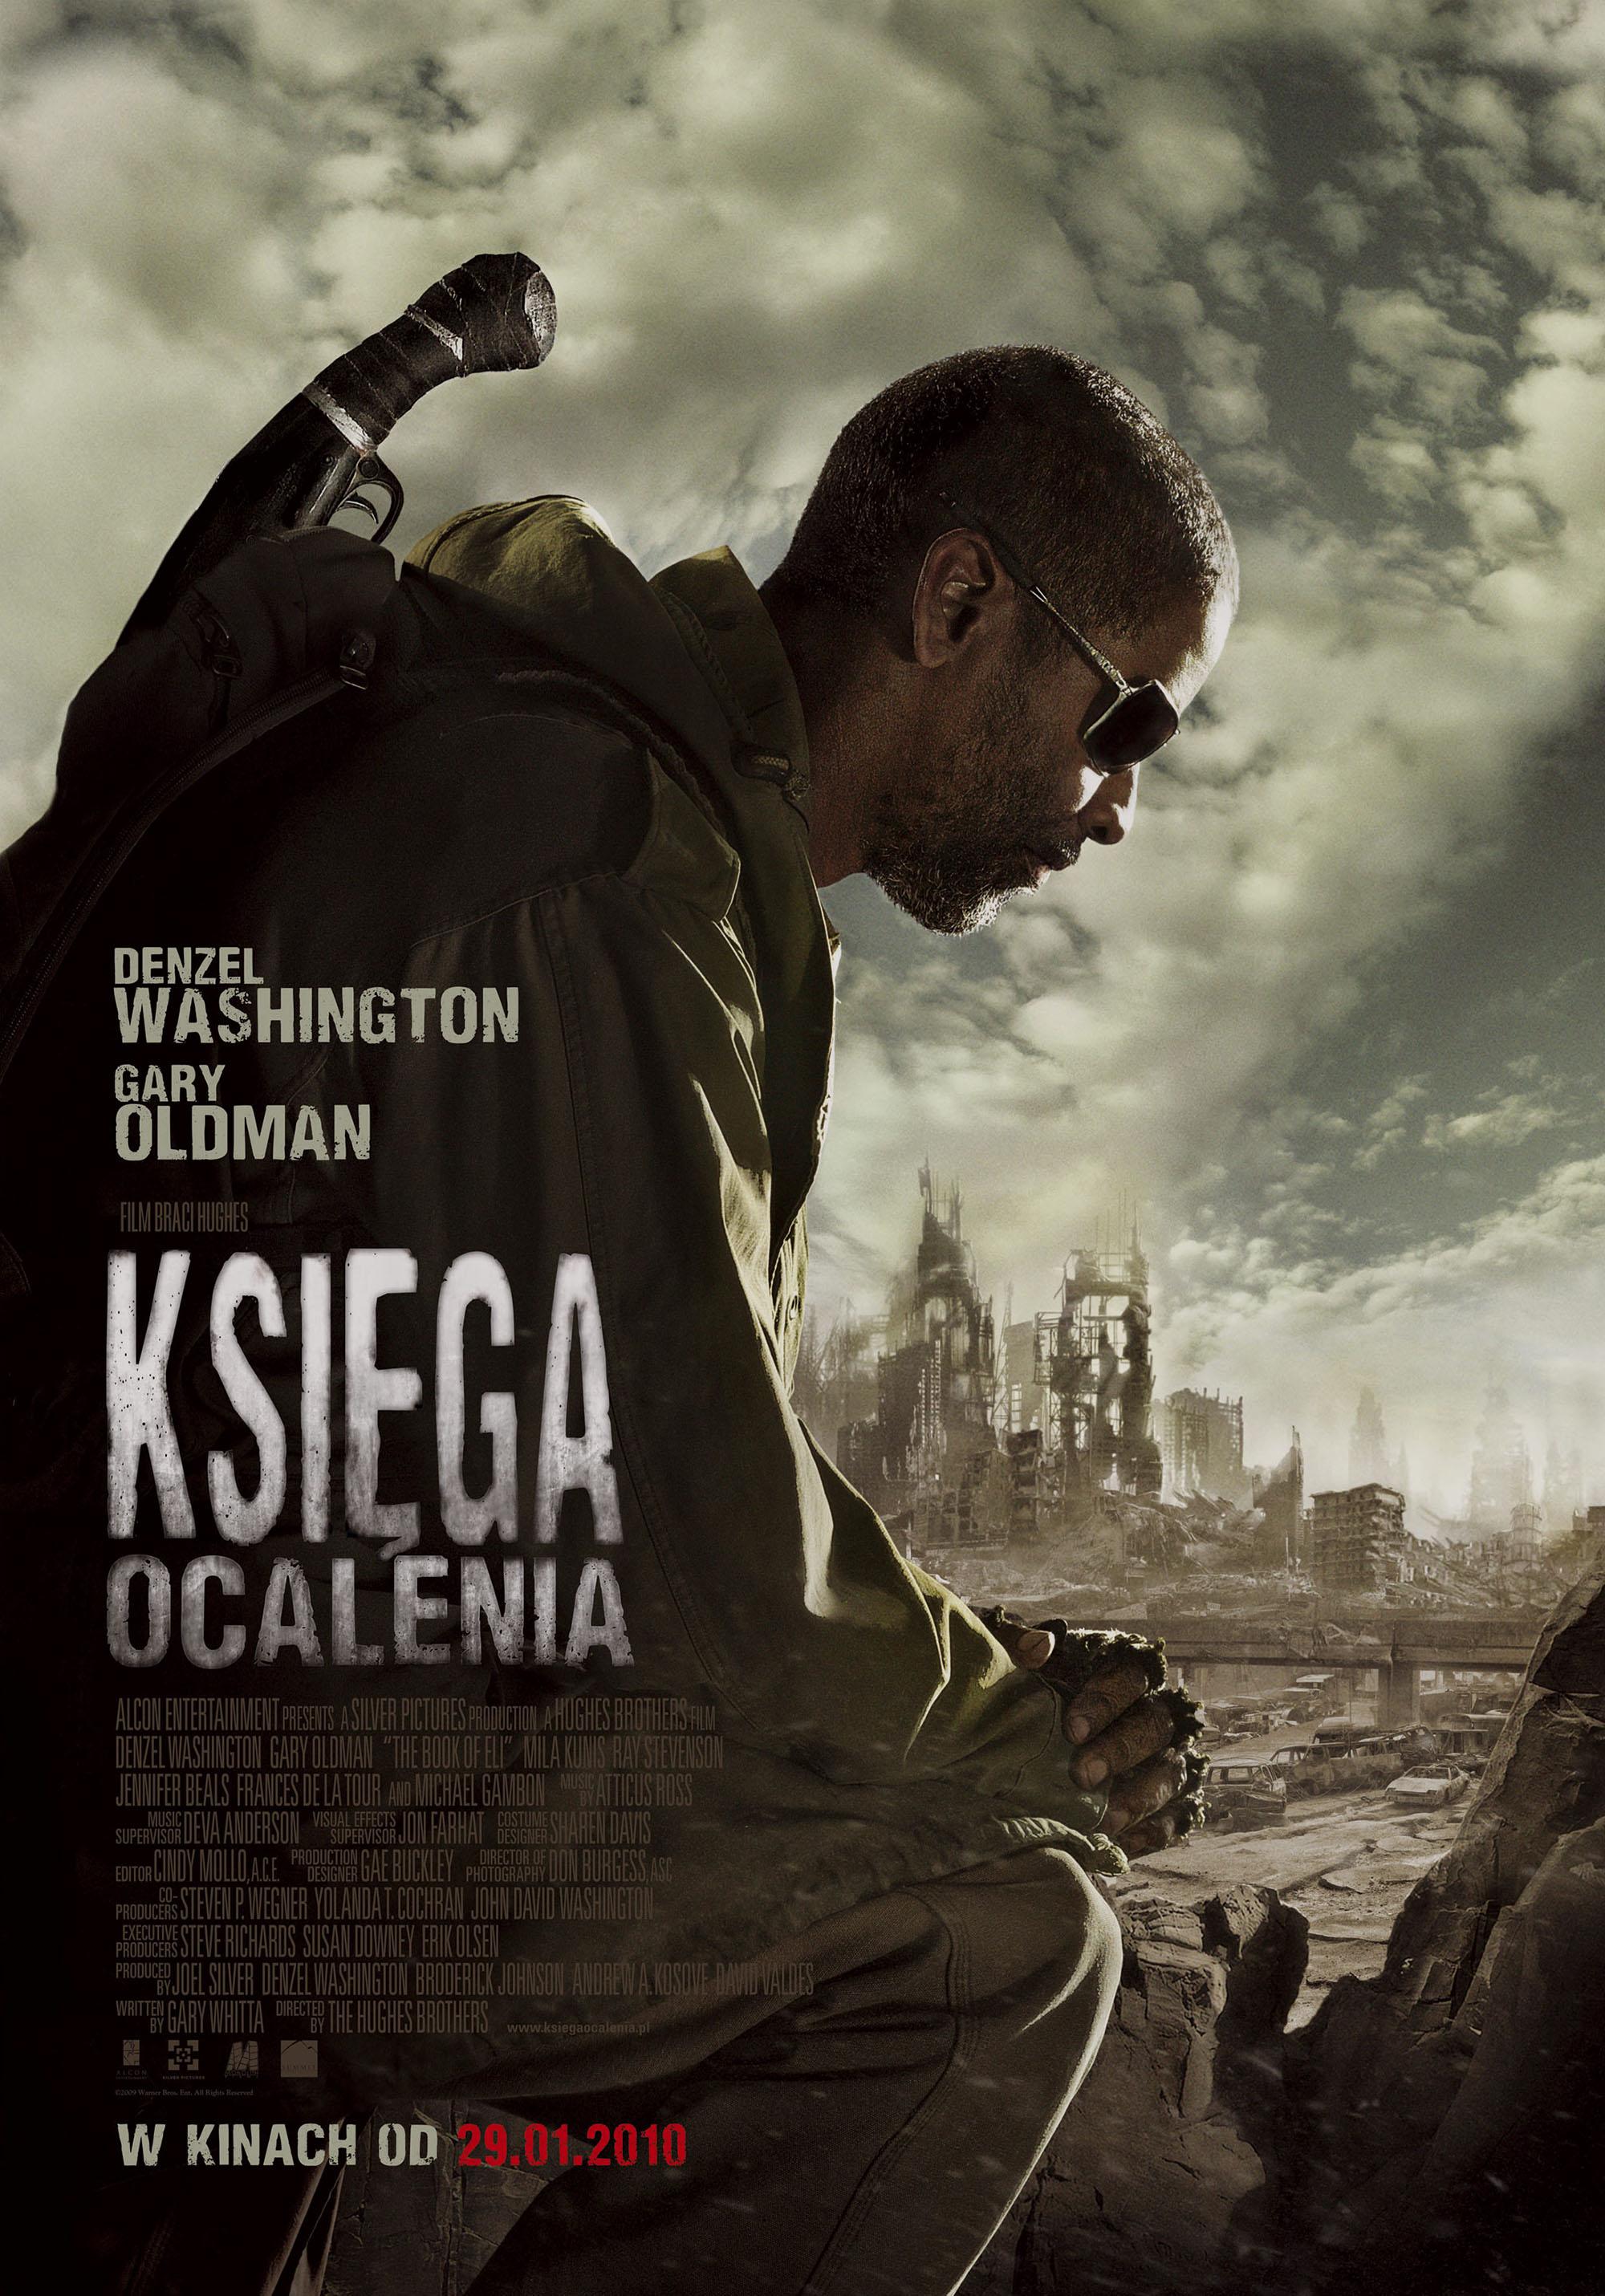 Polski plakat filmu 'Księga Ocalenia'